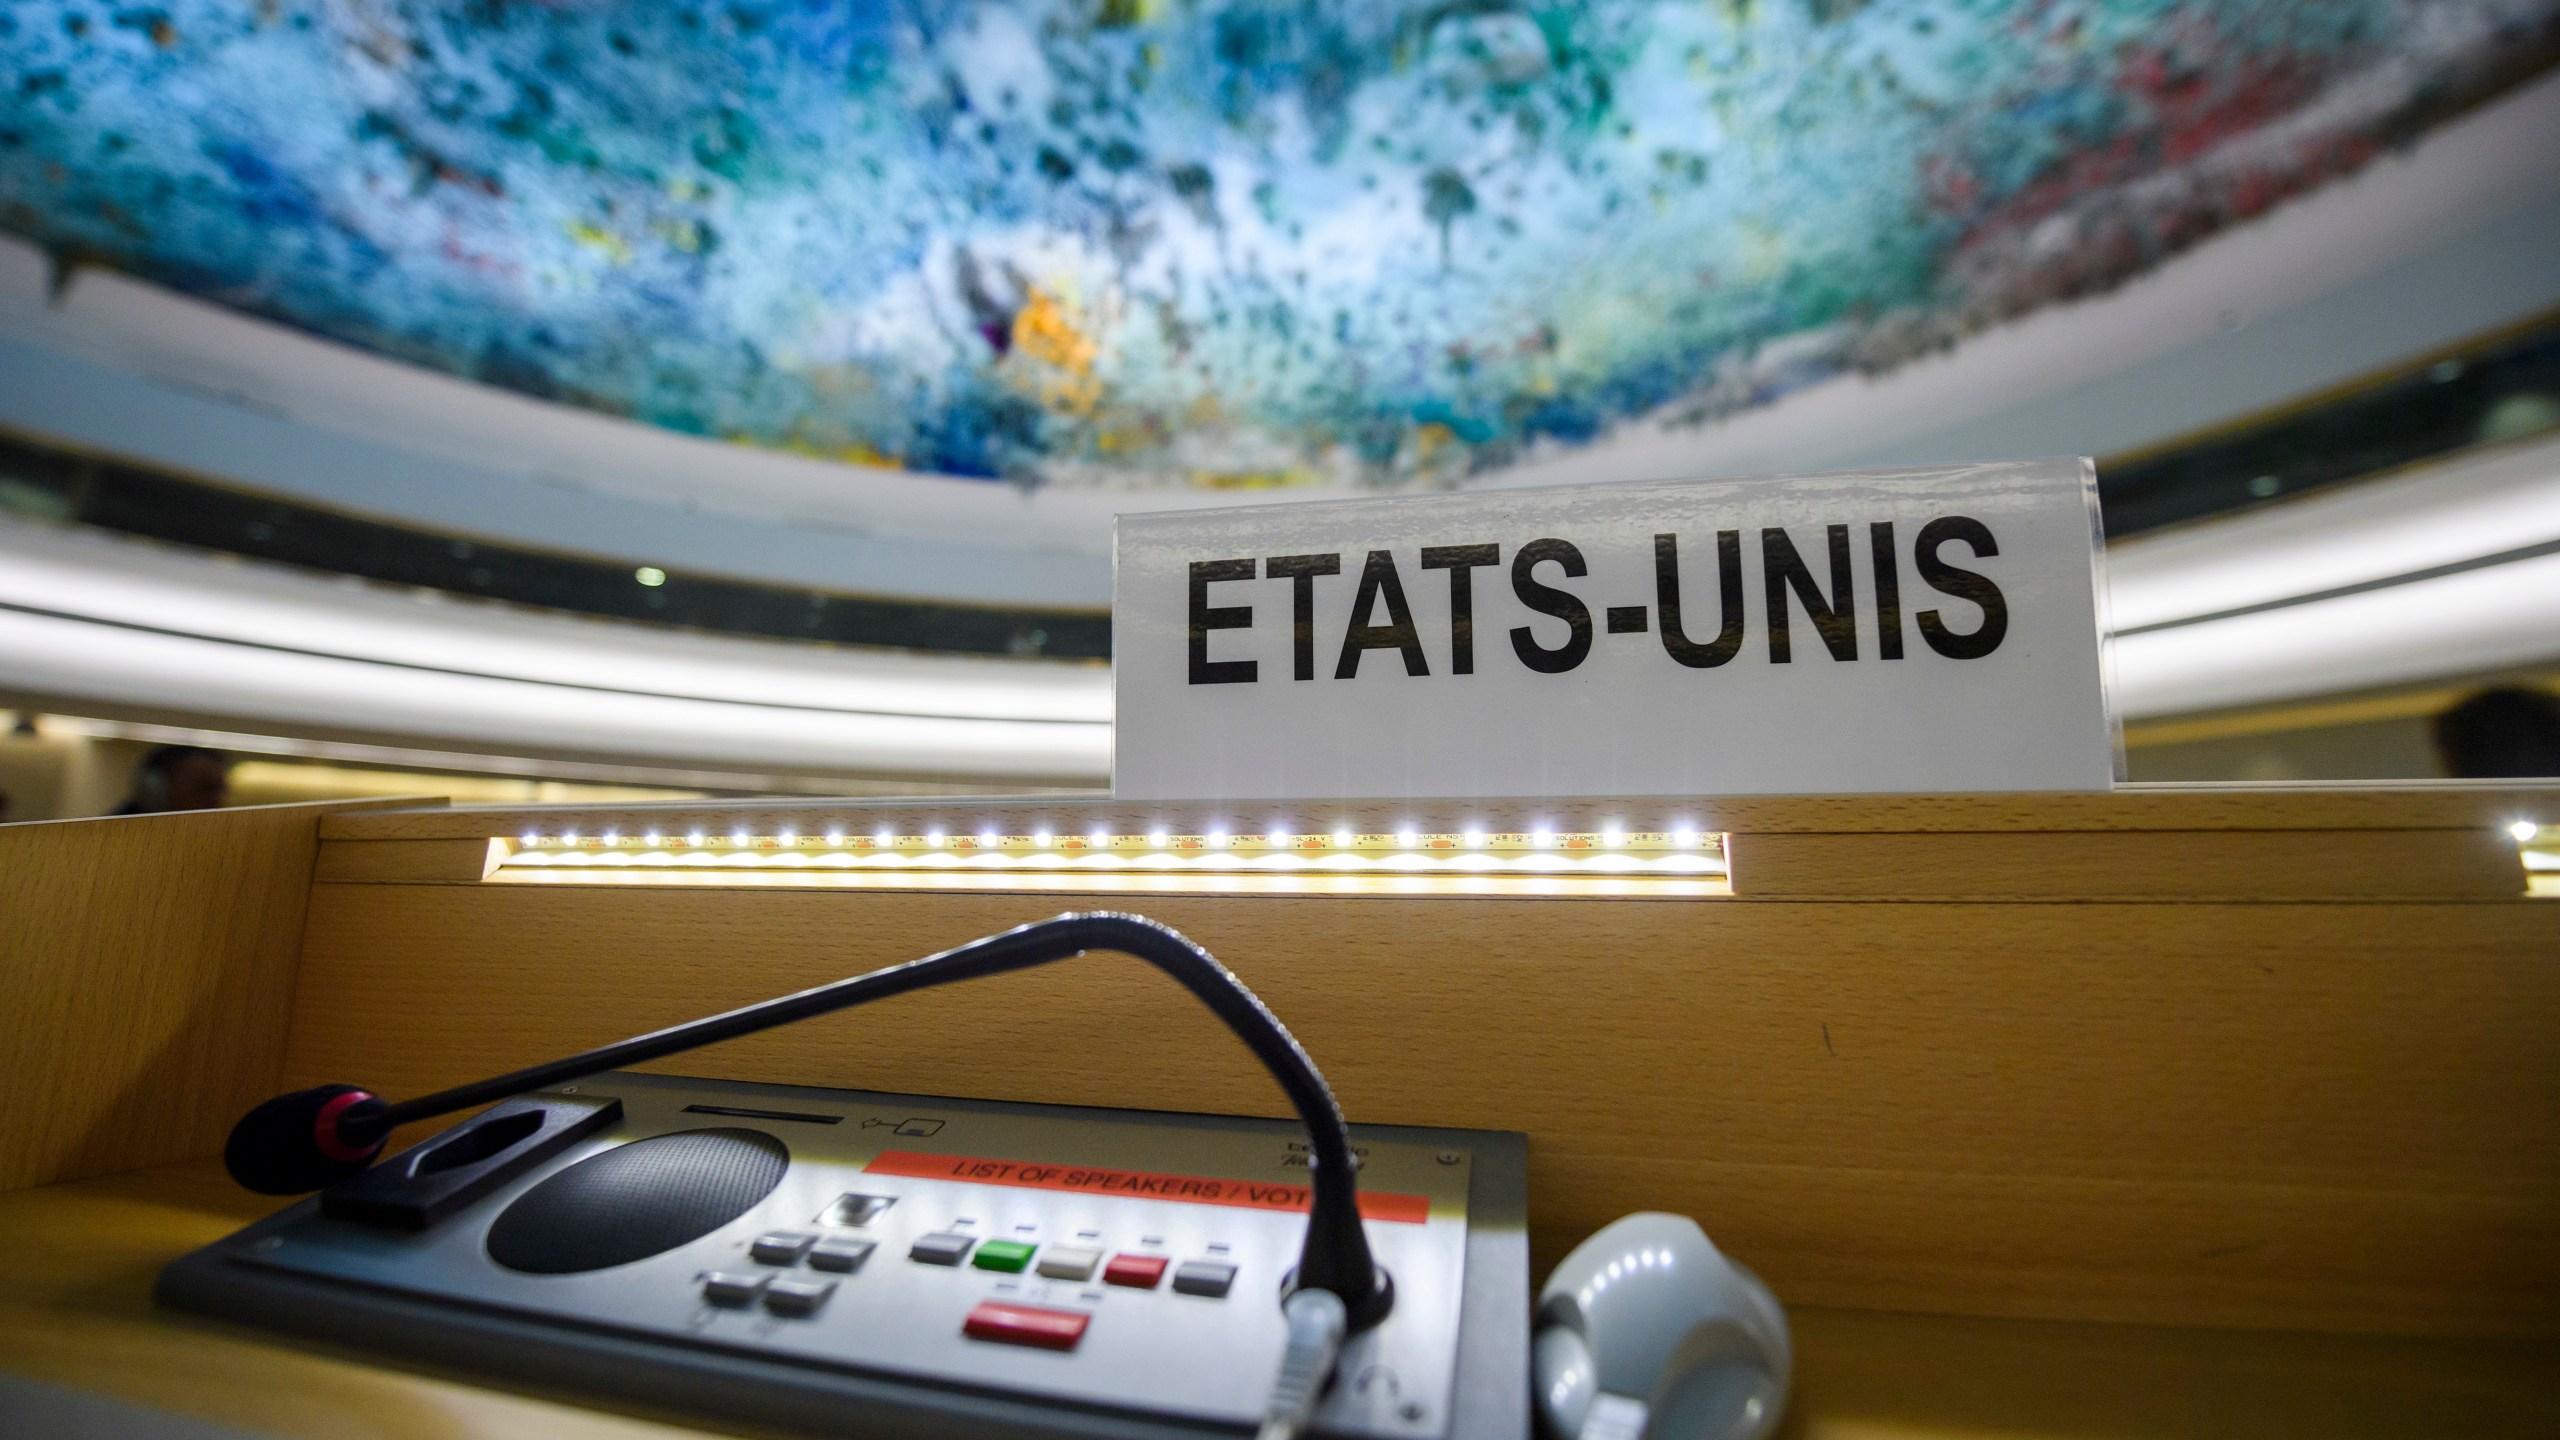 Switzerland_UN_Human_Rights_Council_15669-159532.jpg60615523